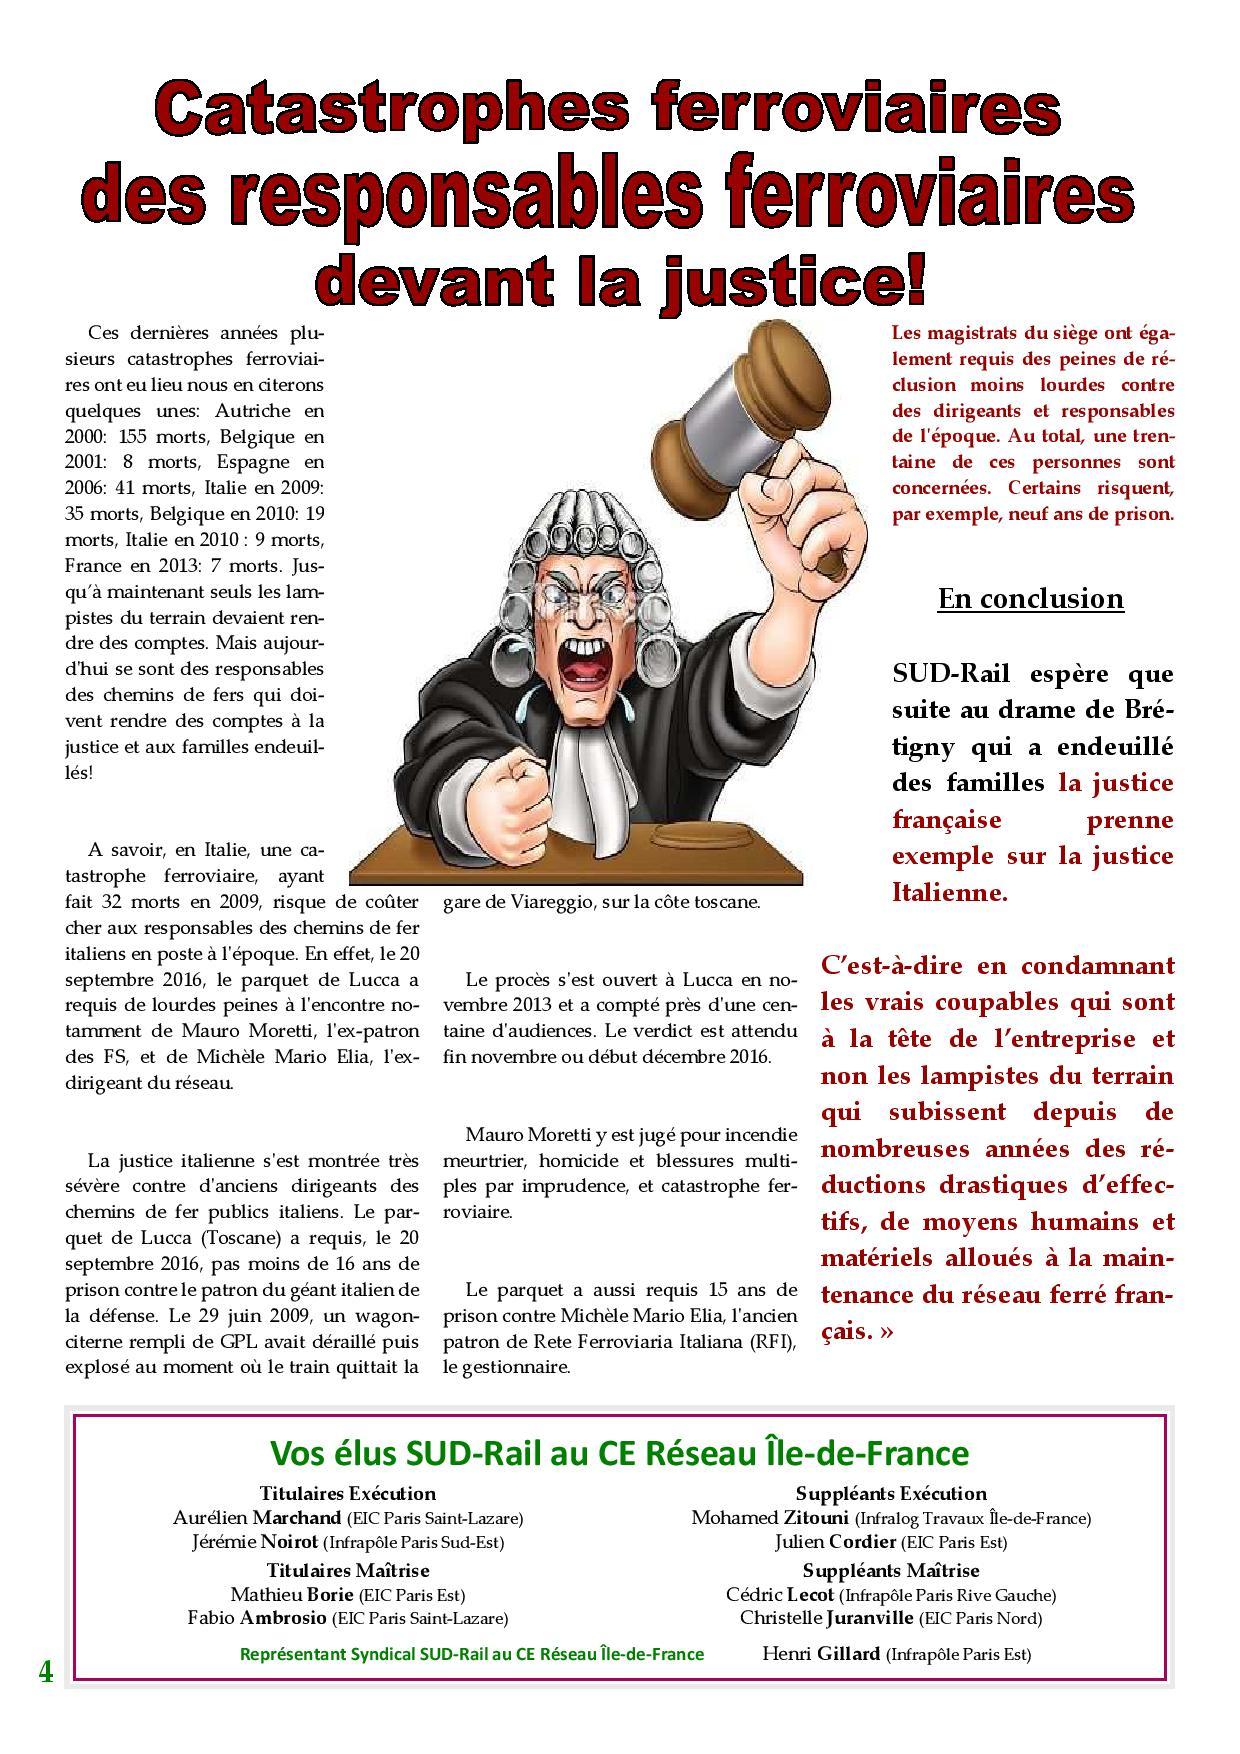 ce-reseau-n6-10-2016-page-004